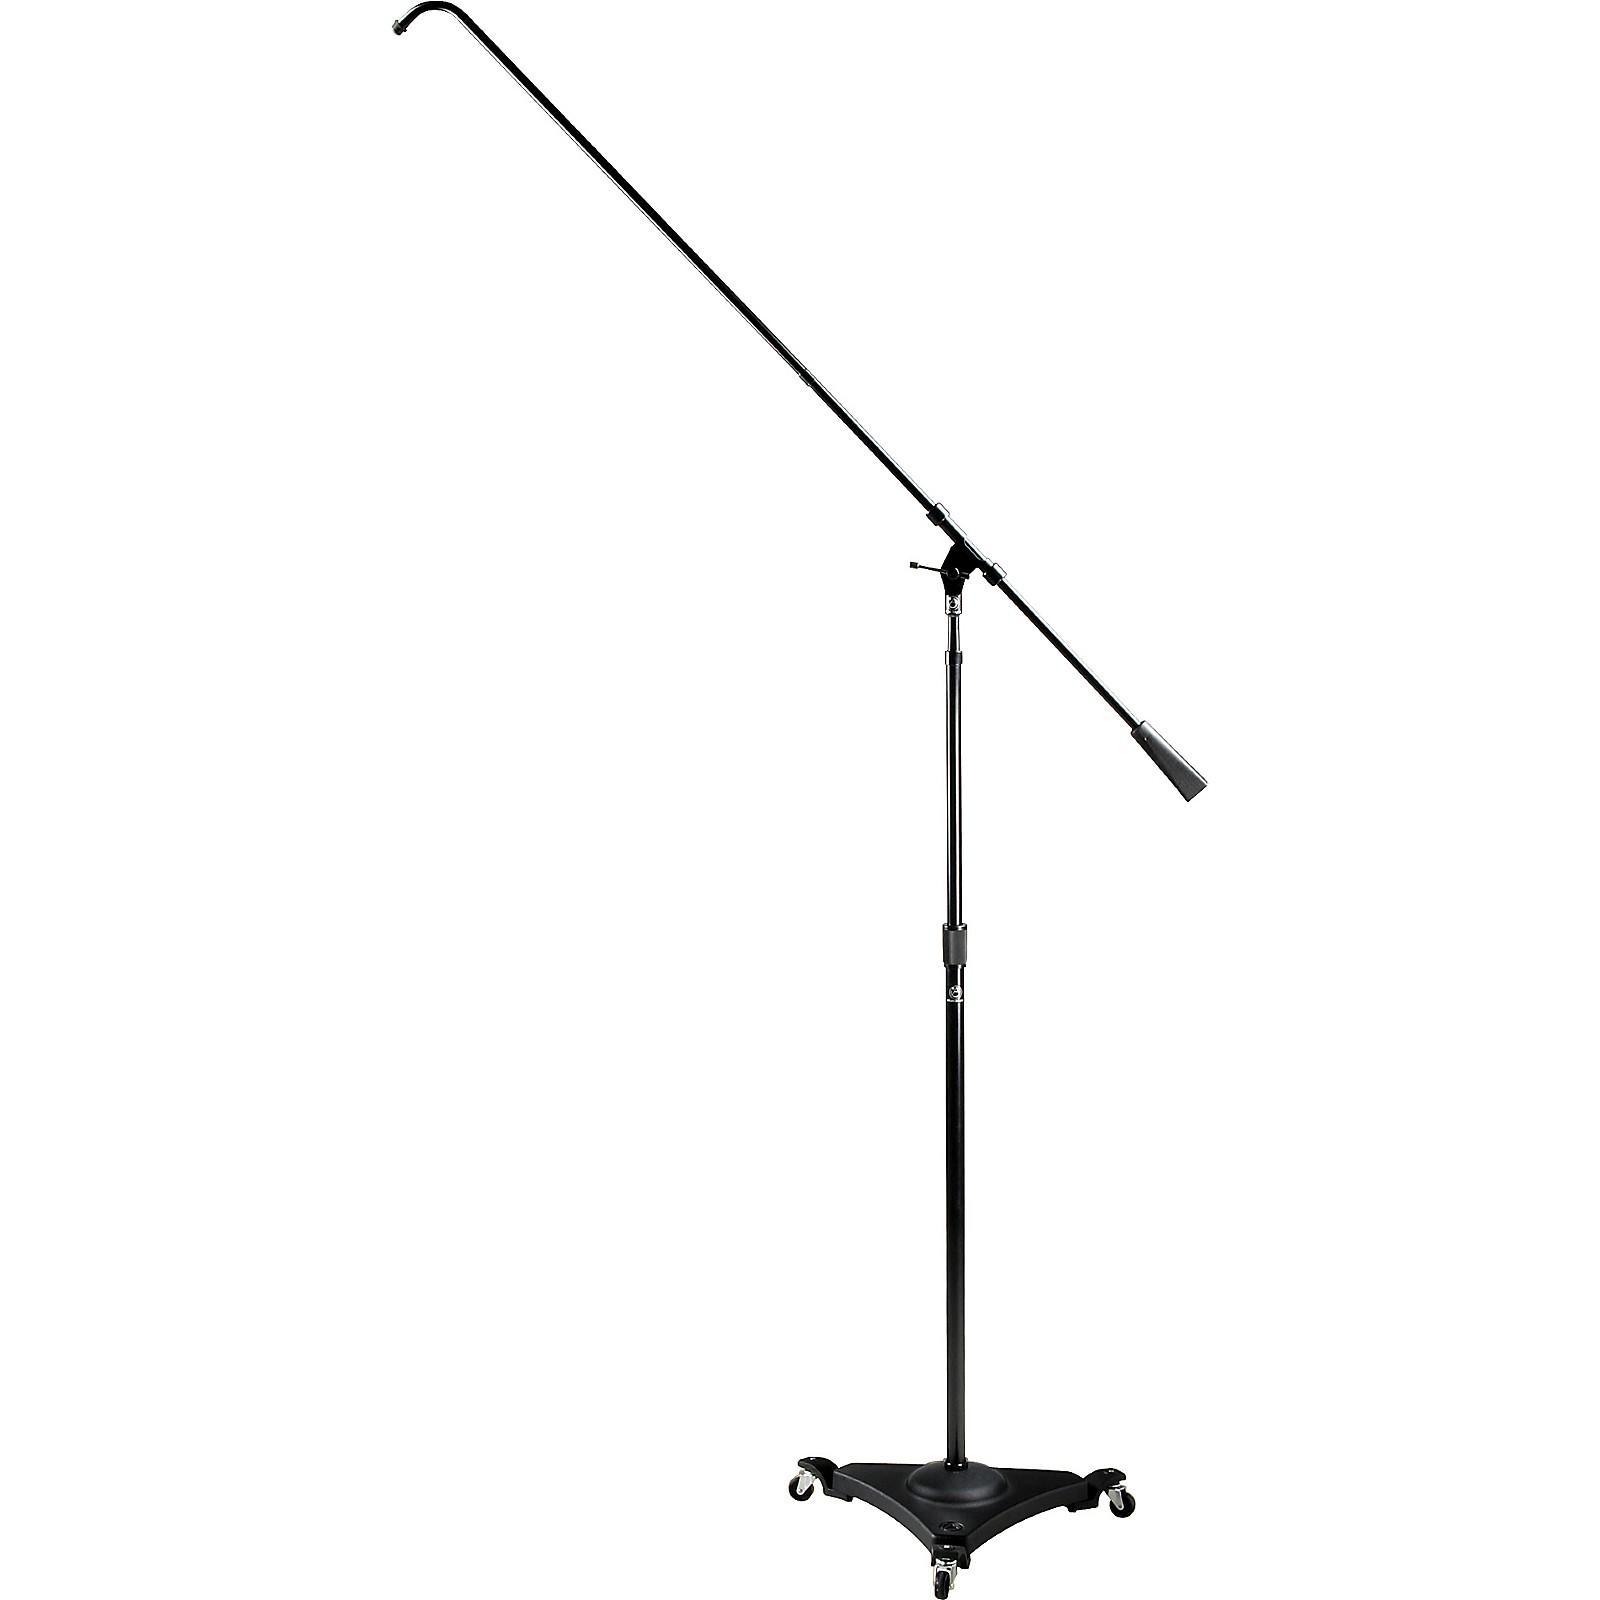 Atlas Sound SB11WE Studio Boom Mic Stand with Air Suspension